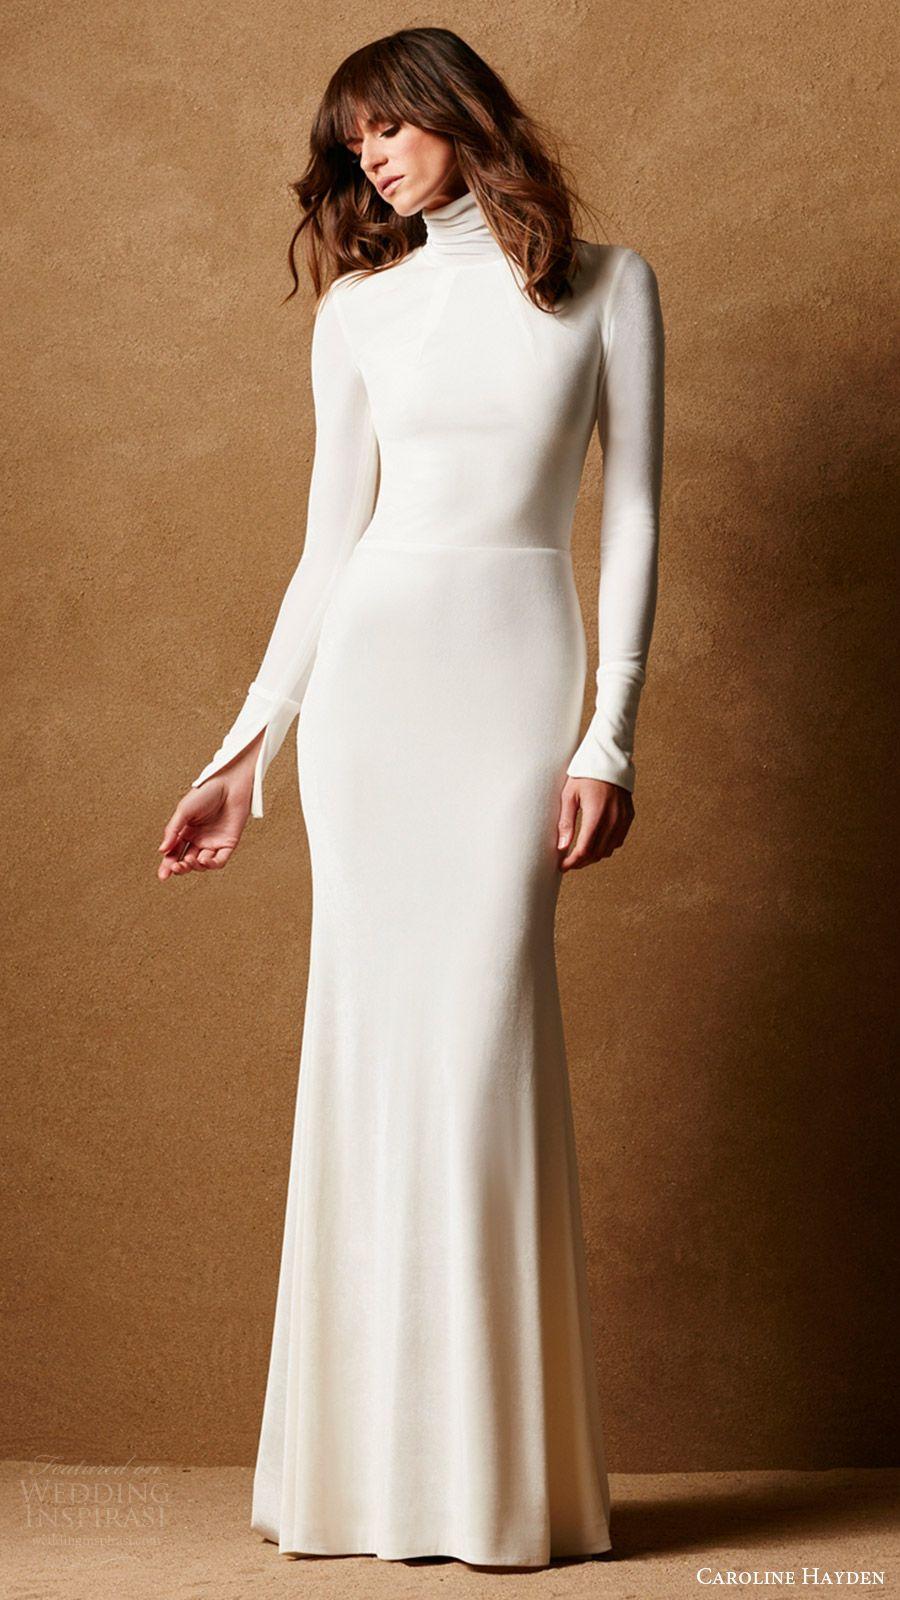 Caroline Hayden Fall 2016 Collection Wedding Dresses Bridal Separates Wedding Inspirasi Wedding Dress Long Sleeve Velvet Wedding Dress Wedding Dresses [ 1600 x 900 Pixel ]